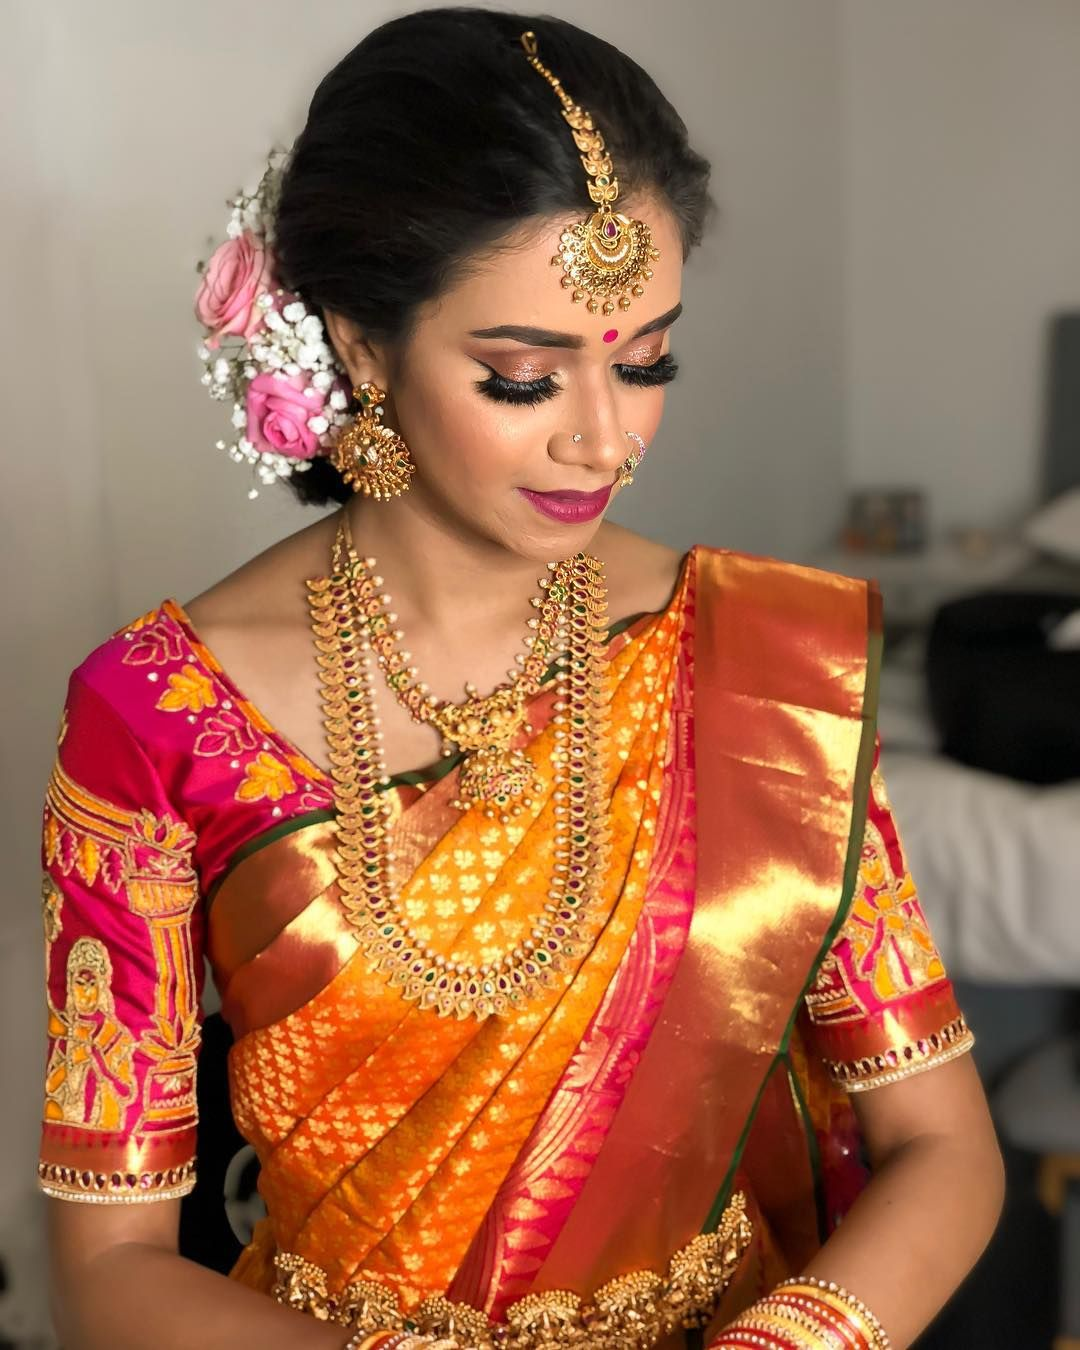 Wedding Hairstyle Tamilnadu: One More Of My Beautiful Bride, Priyanka ️ #tamil #mua